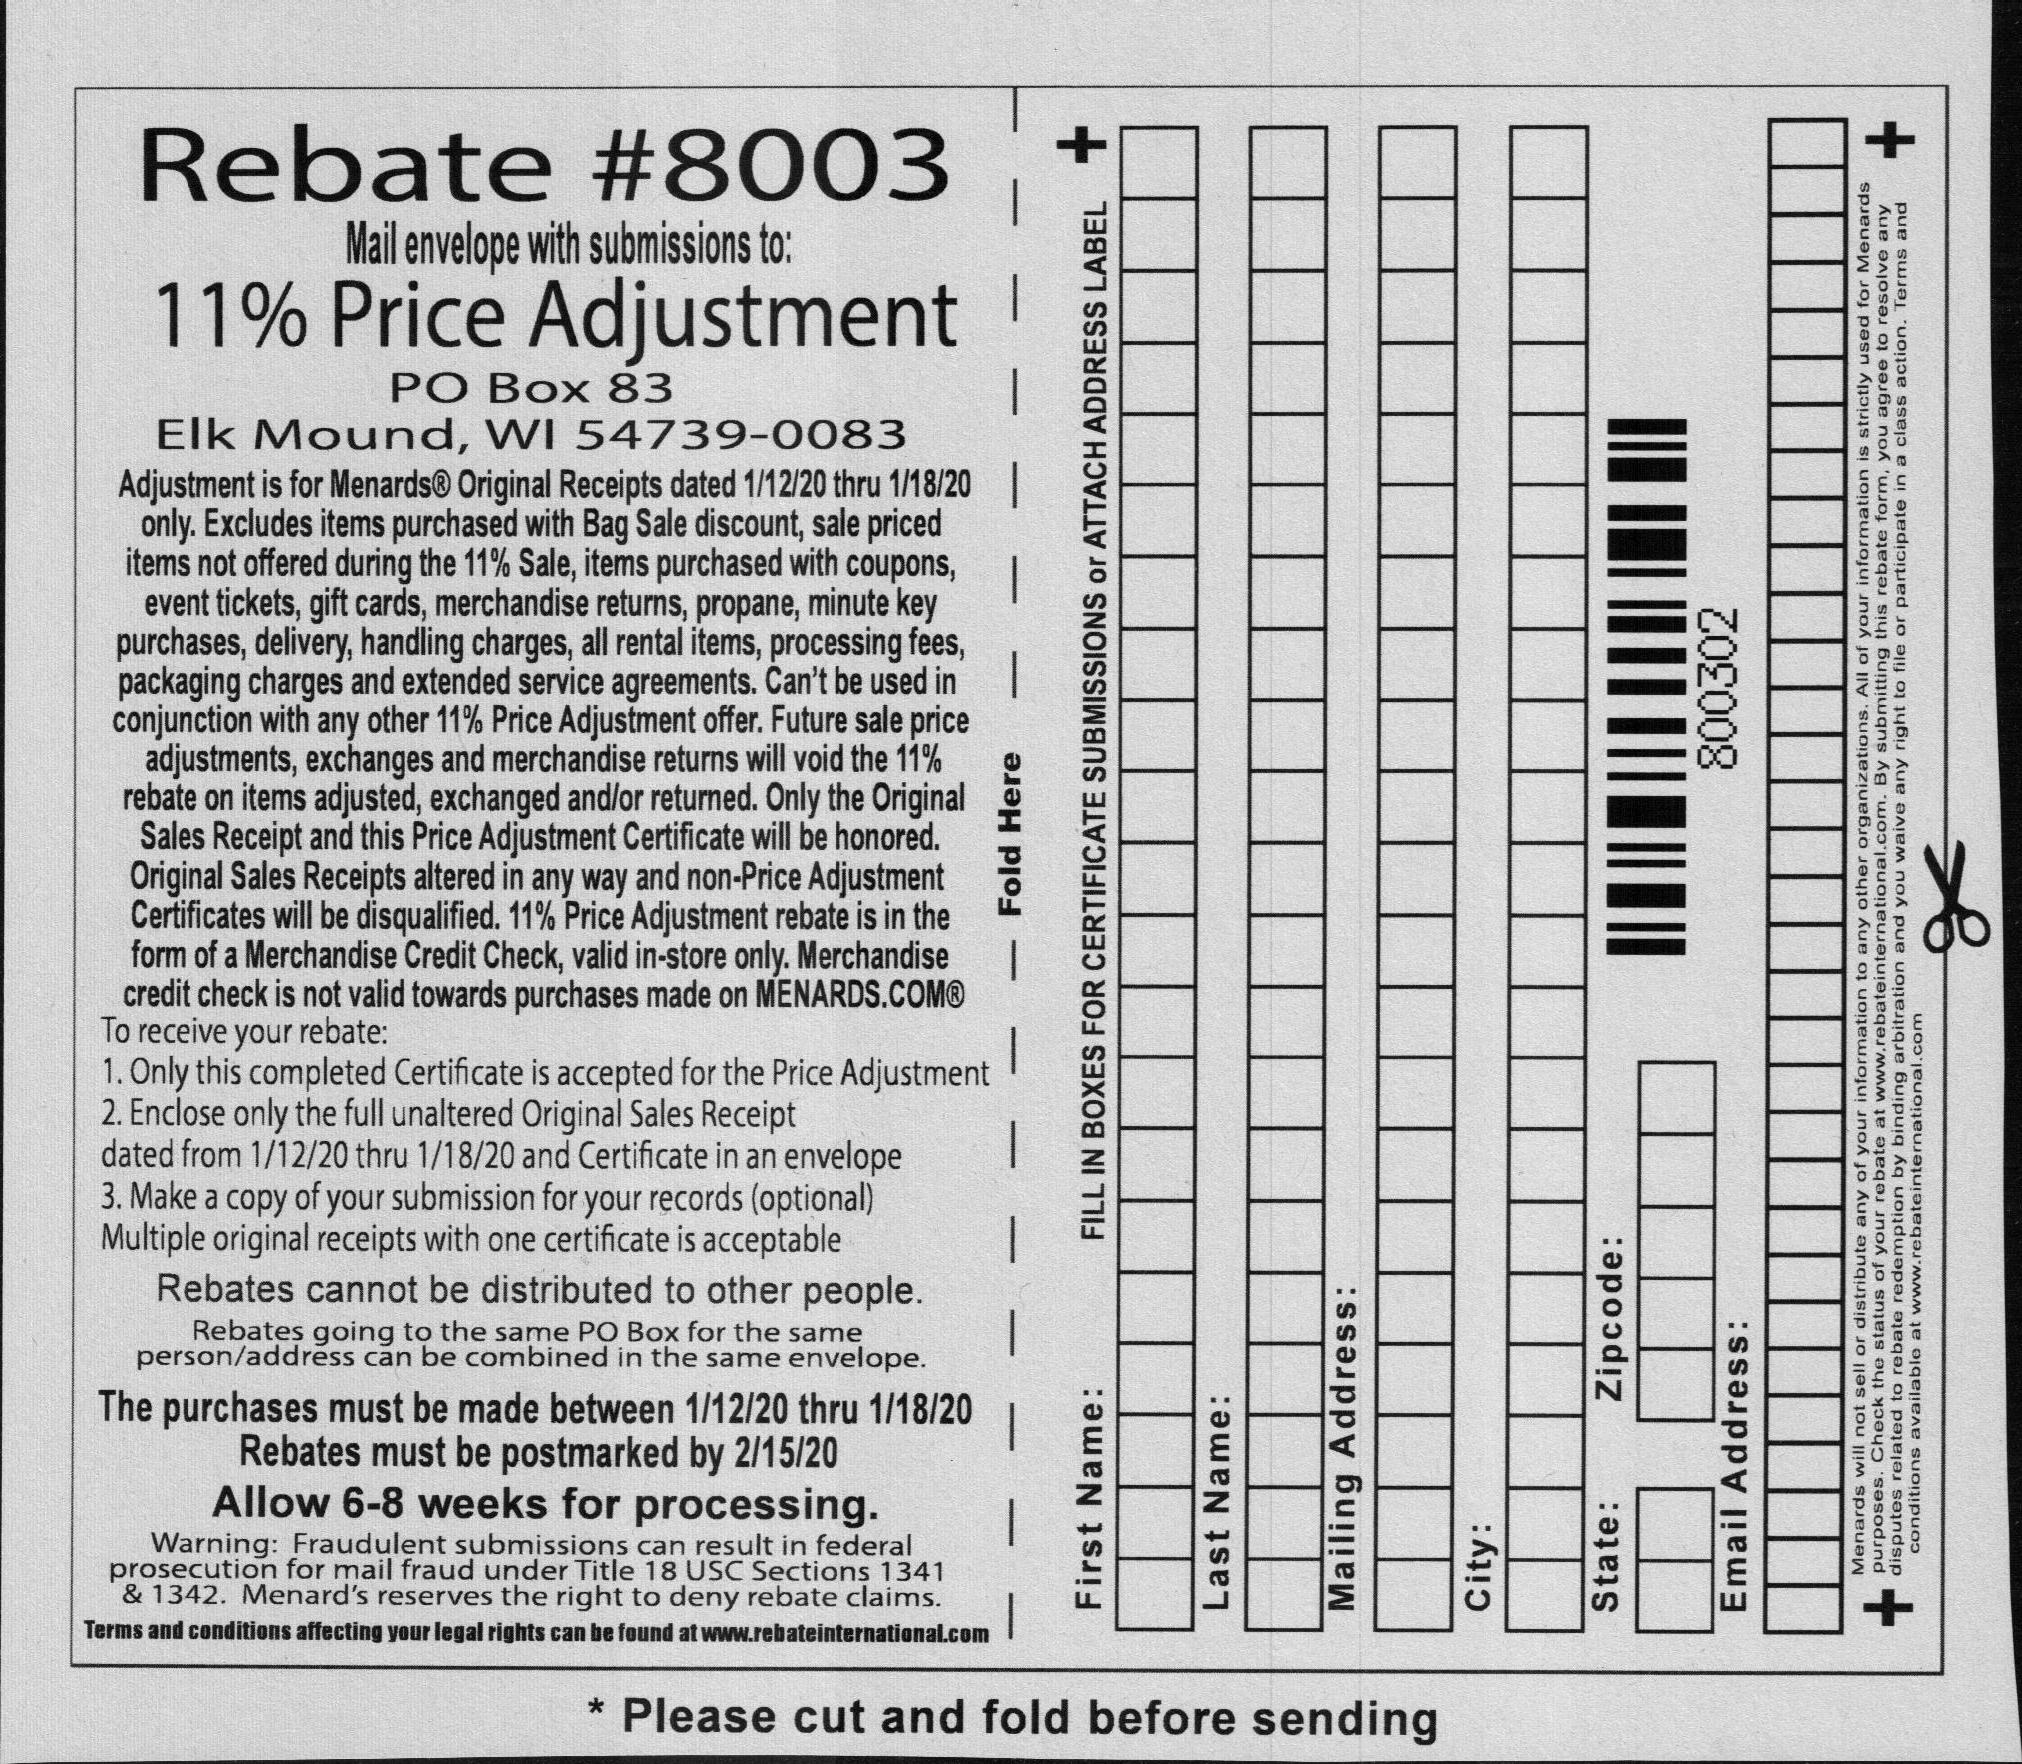 Menards Rebate Adjustment Form